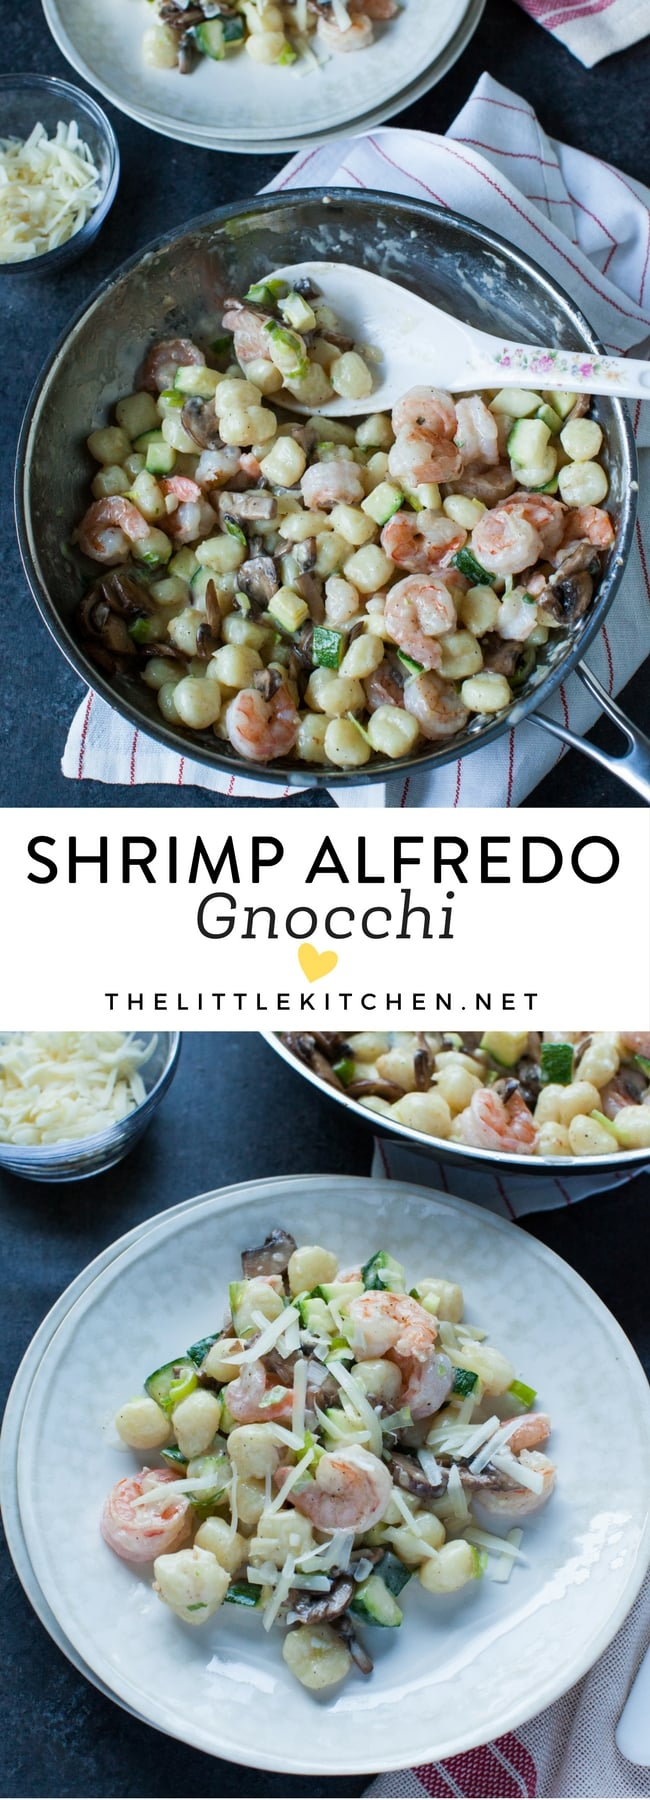 Shrimp Alfredo Gnocchi from thelittlekitchen.net